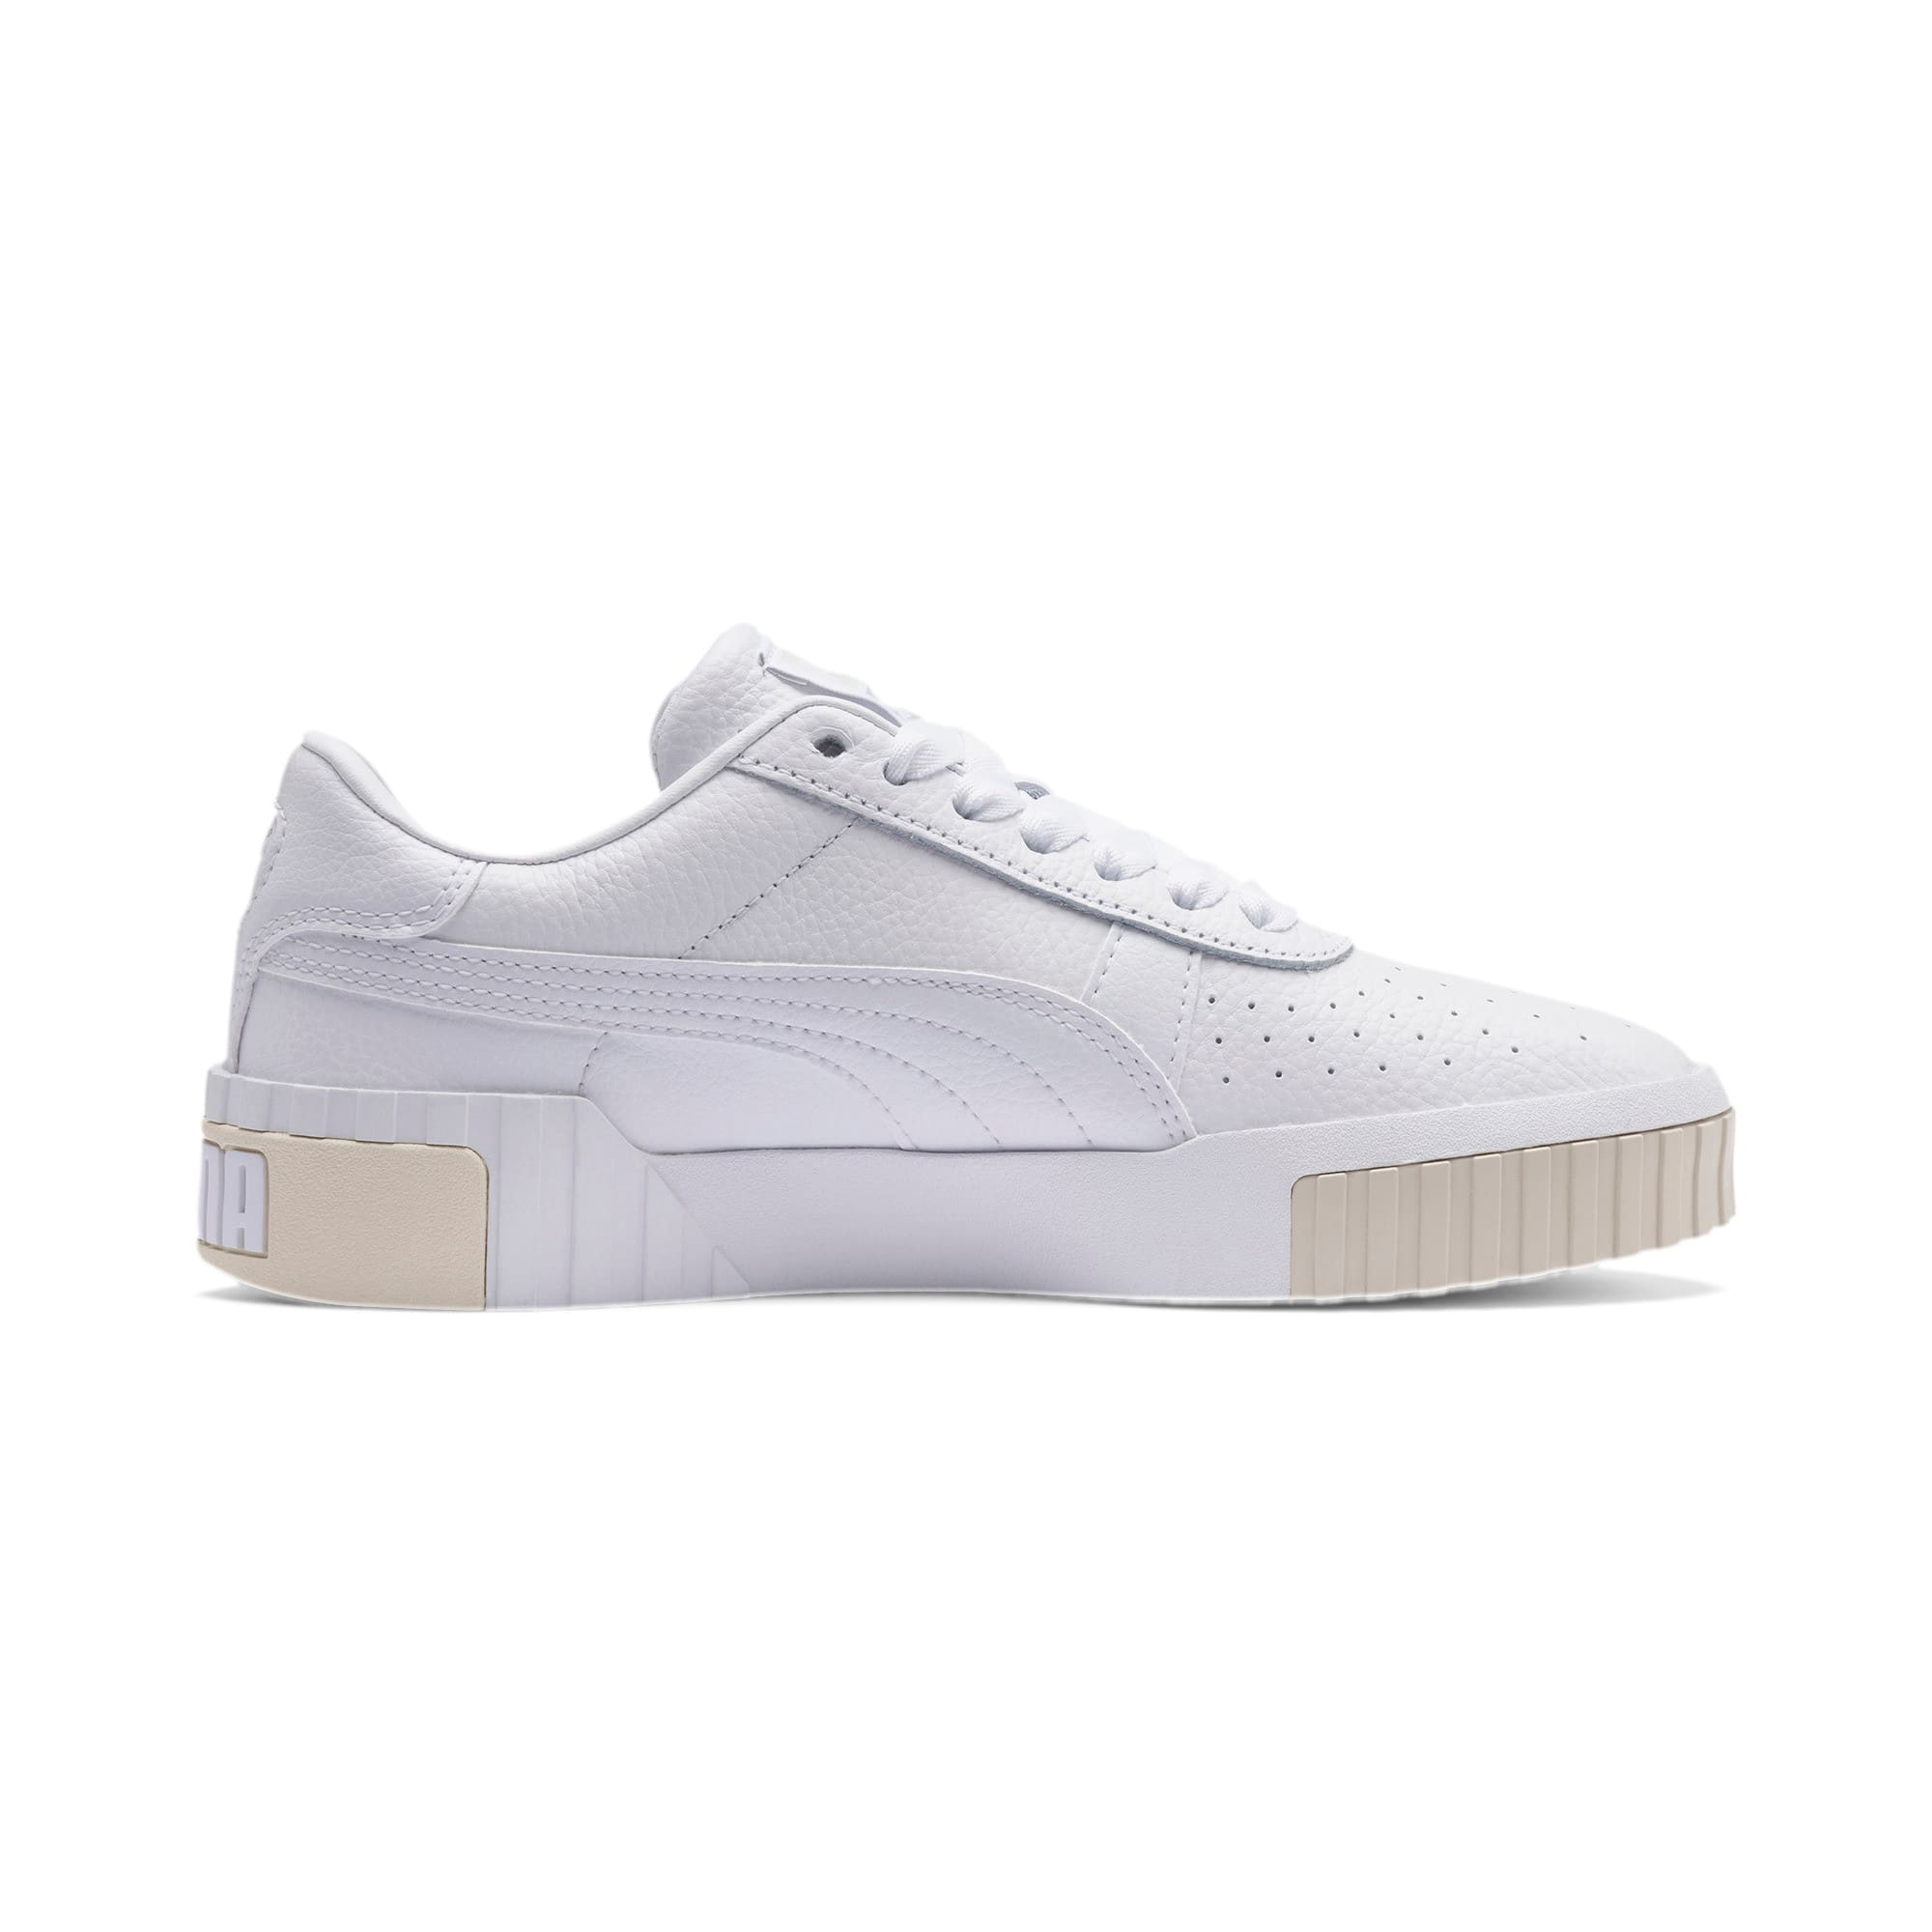 Imagen en miniatura 5 de Zapatillas de mujer Cali, Puma White-Whisper White, mediana